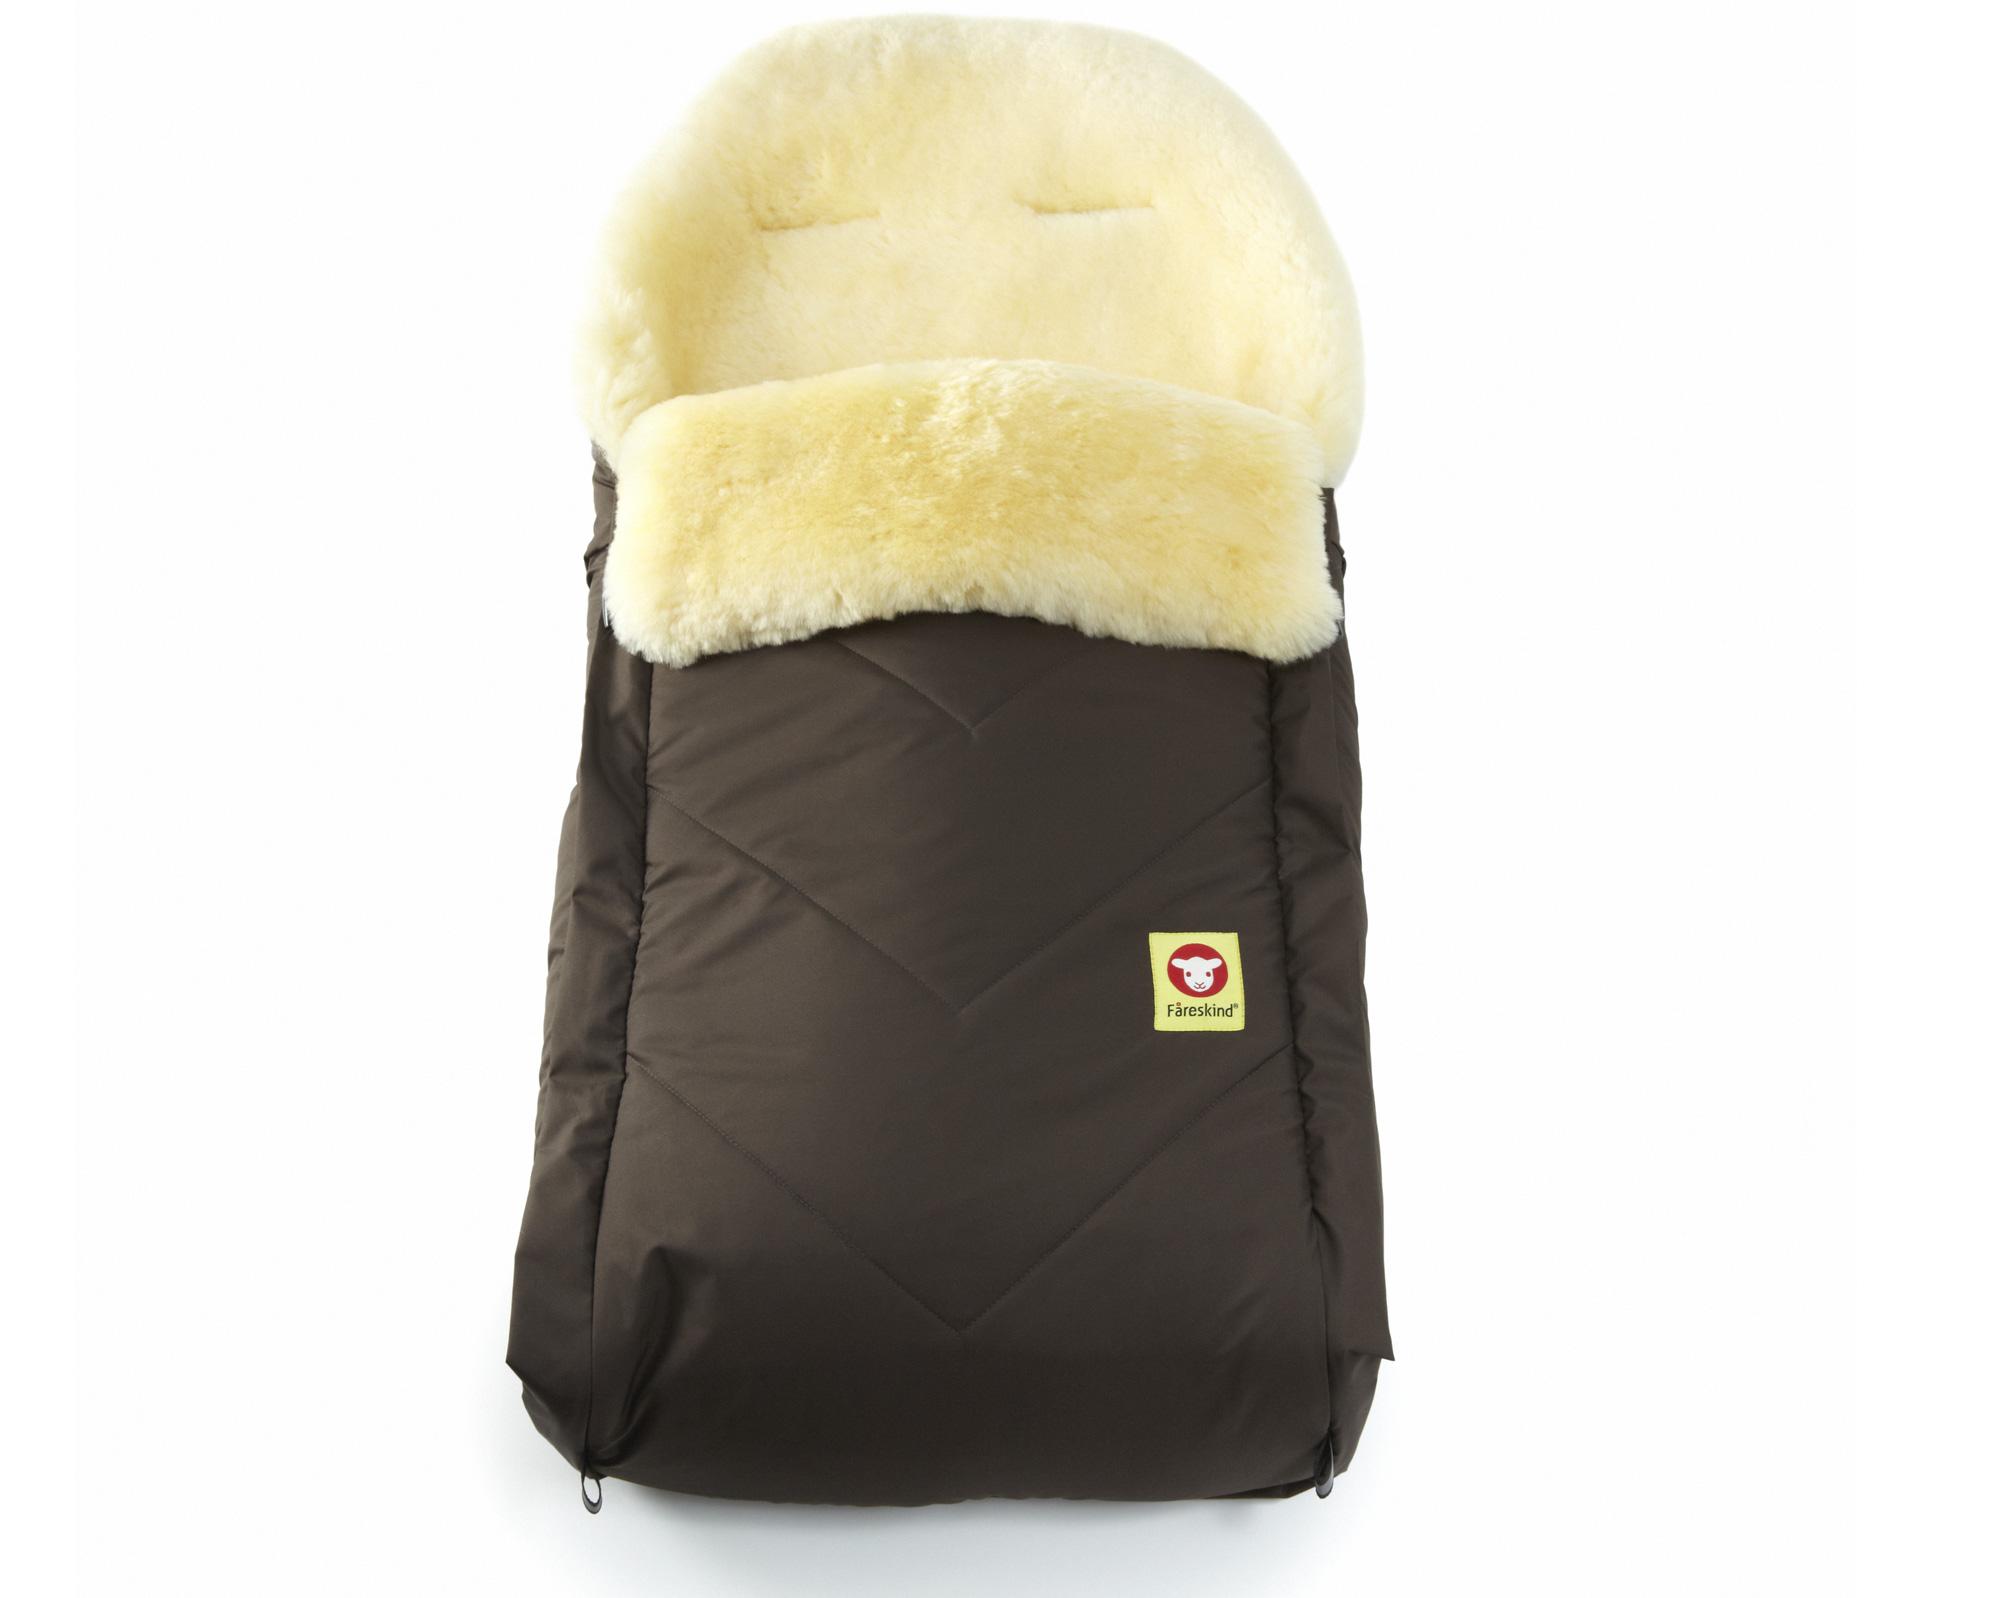 fc5d286e0 Baby Go Comfy - Fareskind Baby Bunting Bag